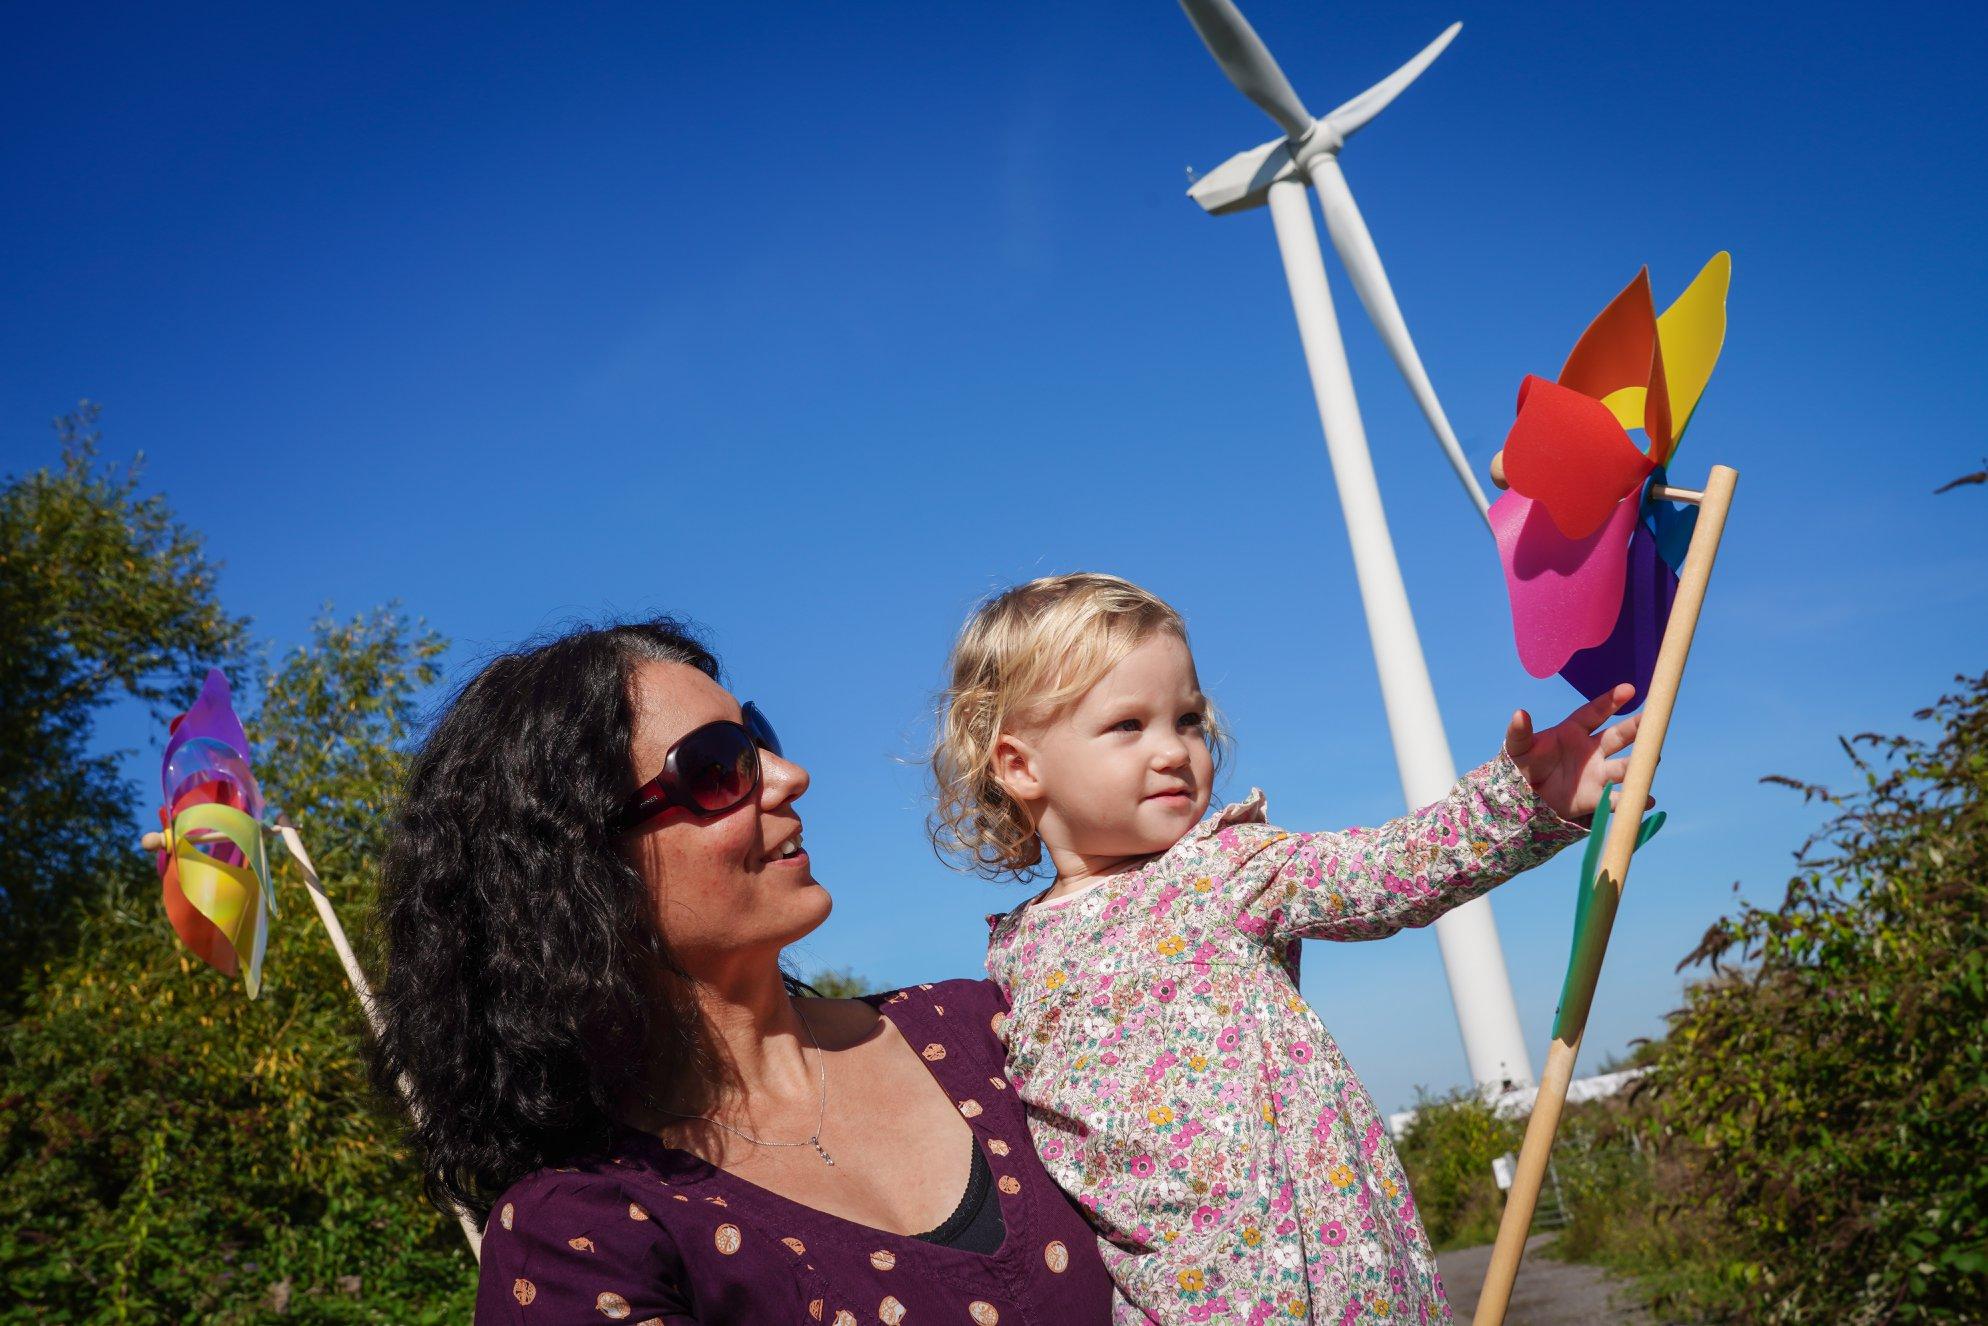 25 years of renewable energy generation in Britain